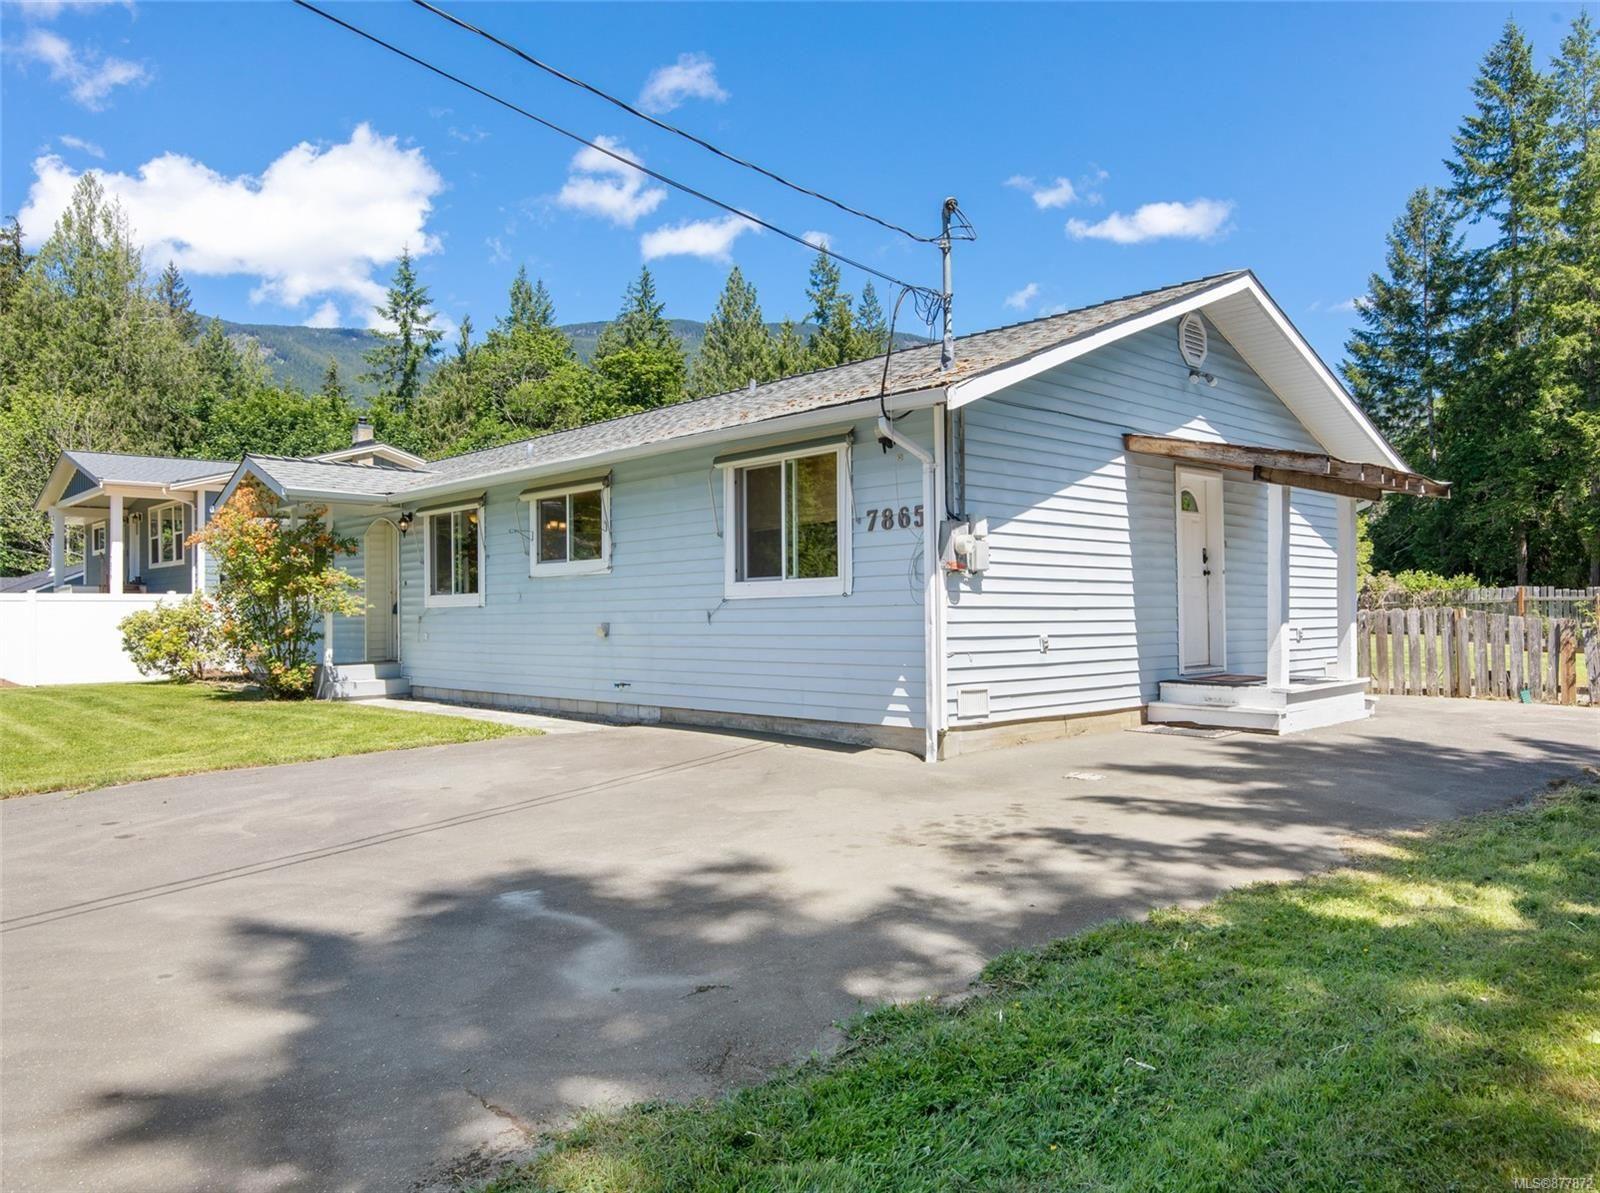 Photo 26: Photos: 7865 Wardrop Rd in : PA Port Alberni House for sale (Port Alberni)  : MLS®# 877872